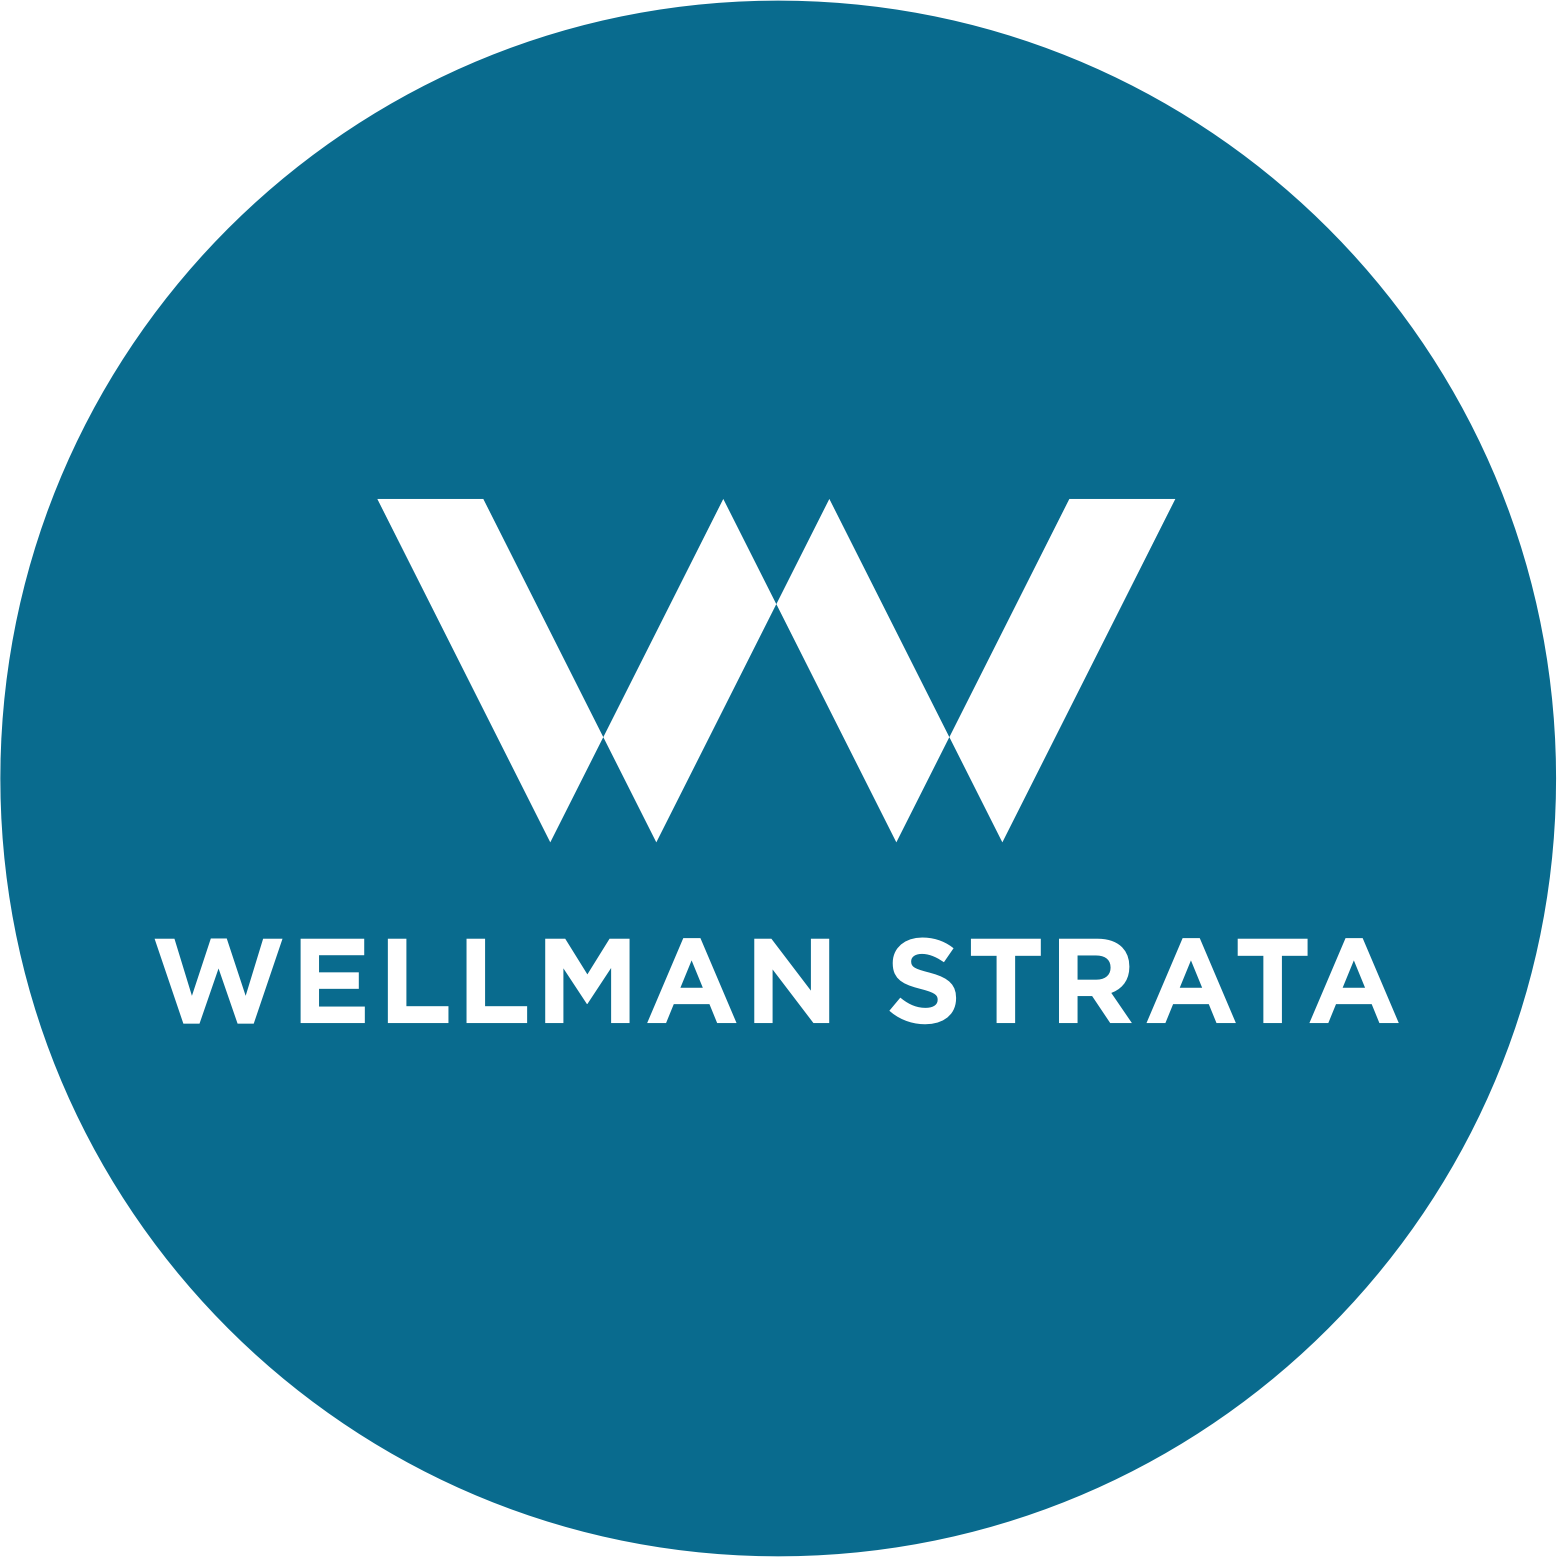 Wellman Strata